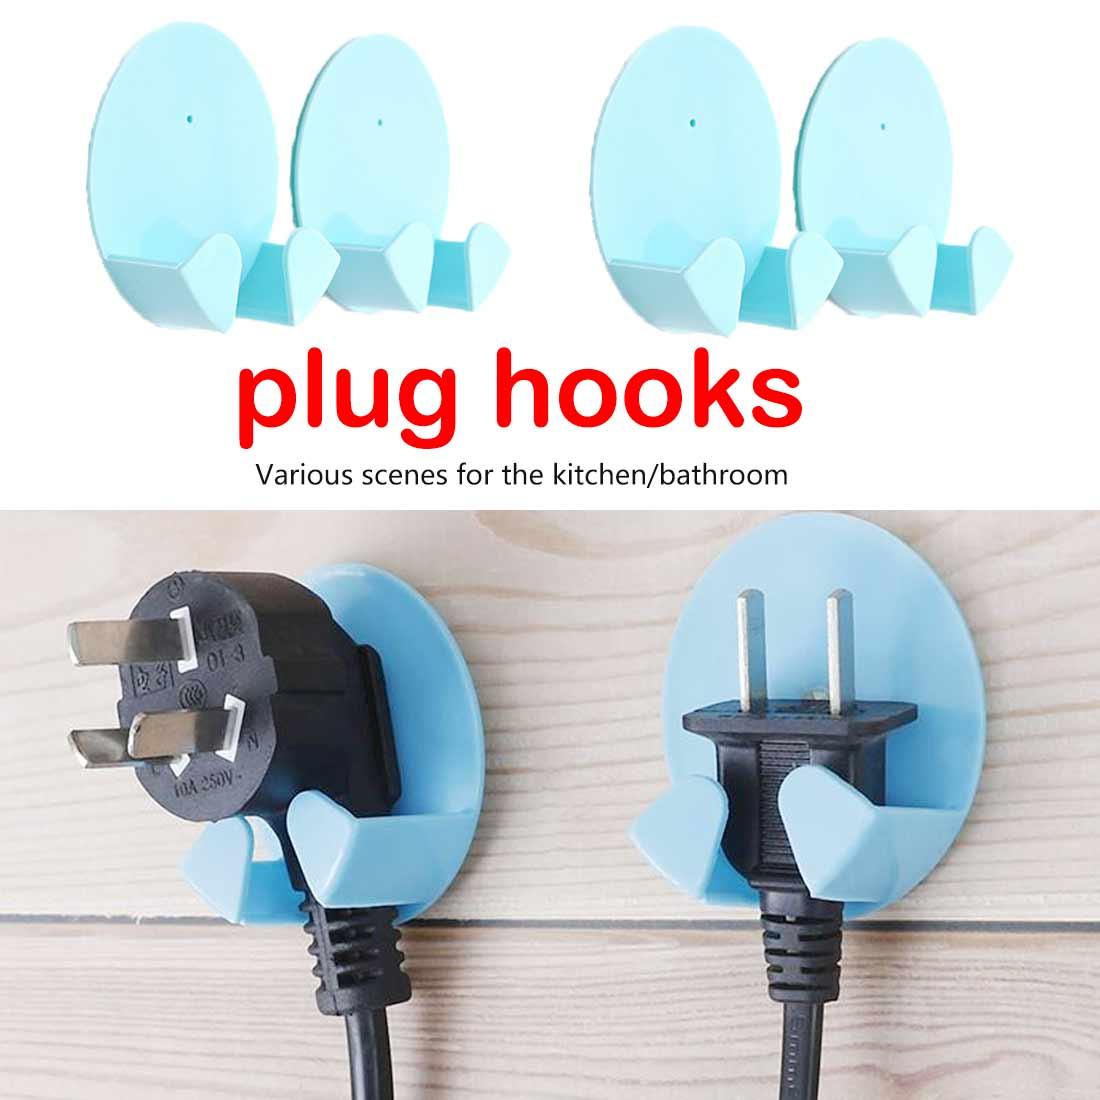 Plug Holder 2 Pcs Practical Gum Hooks Plug Hooks For Household Usage Colors Random Daily Necessities Hooks Storage Holder